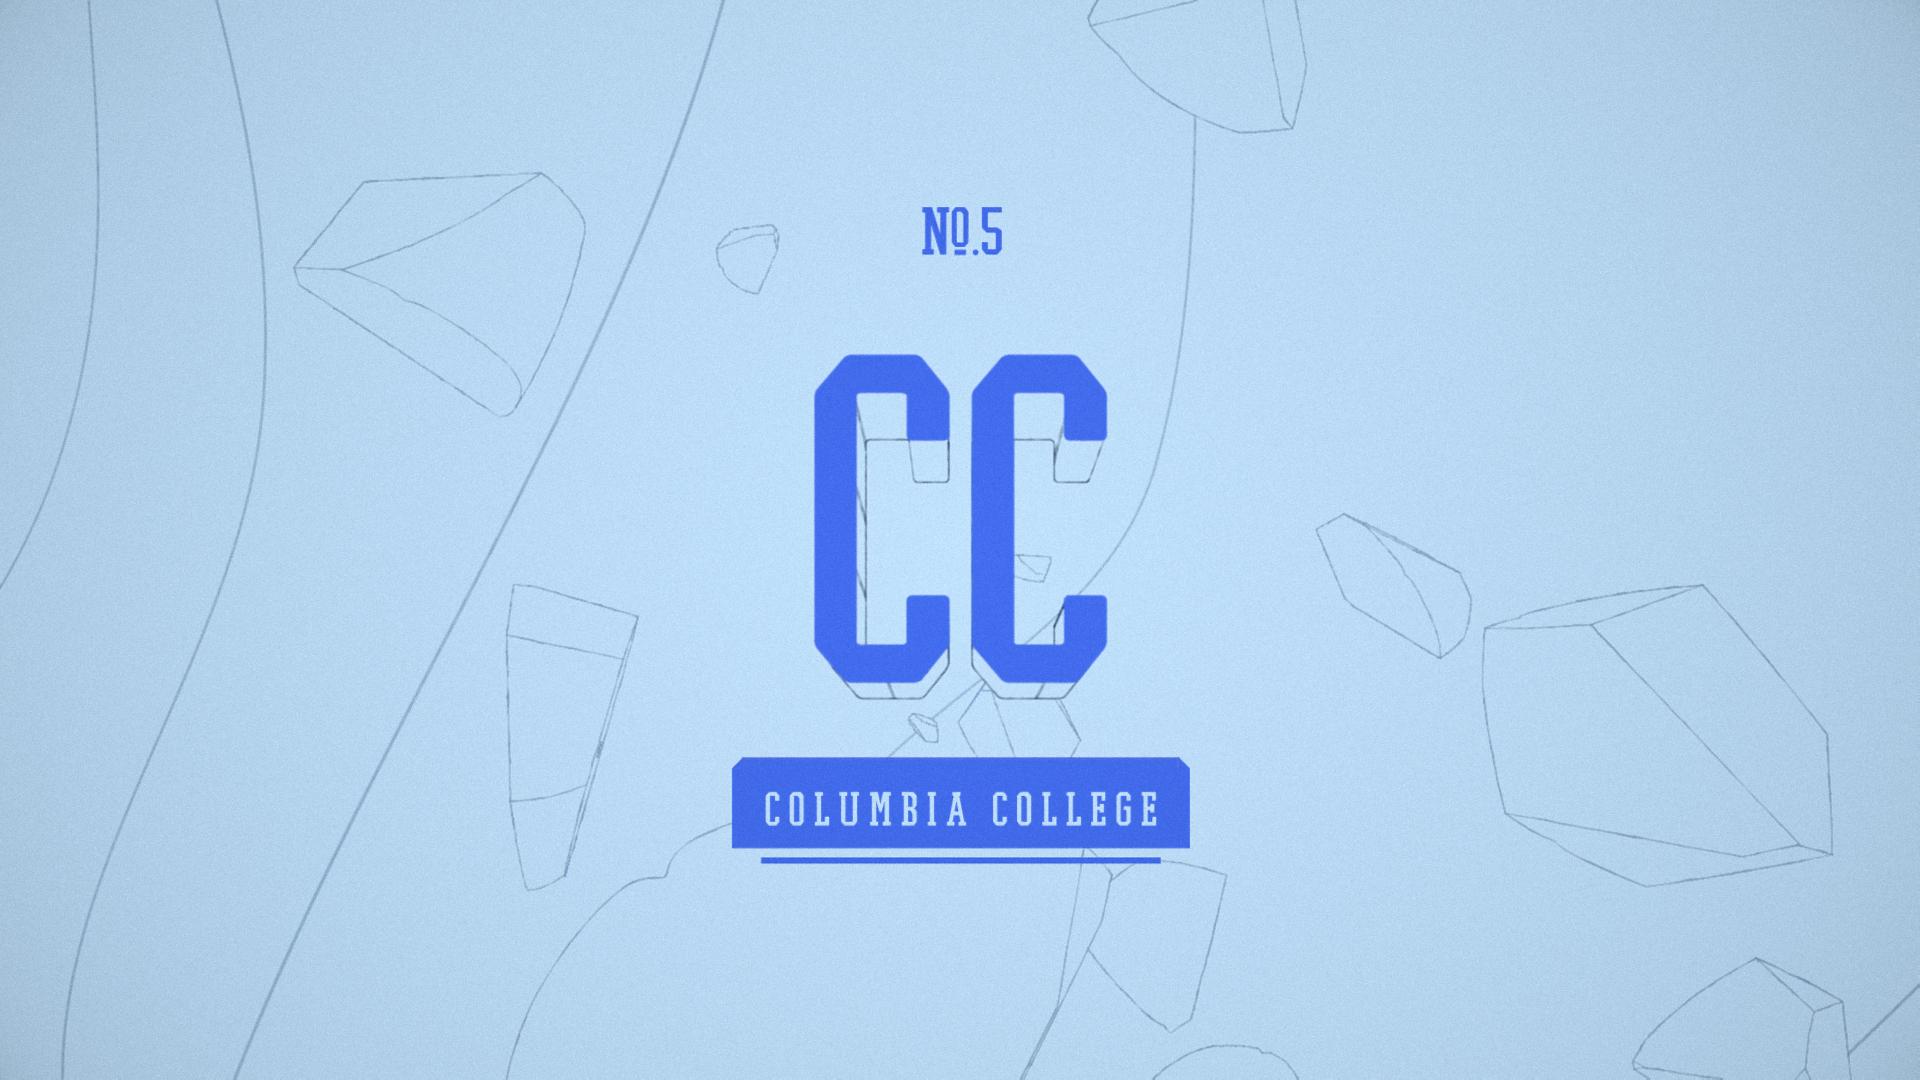 CC_Letters.jpg